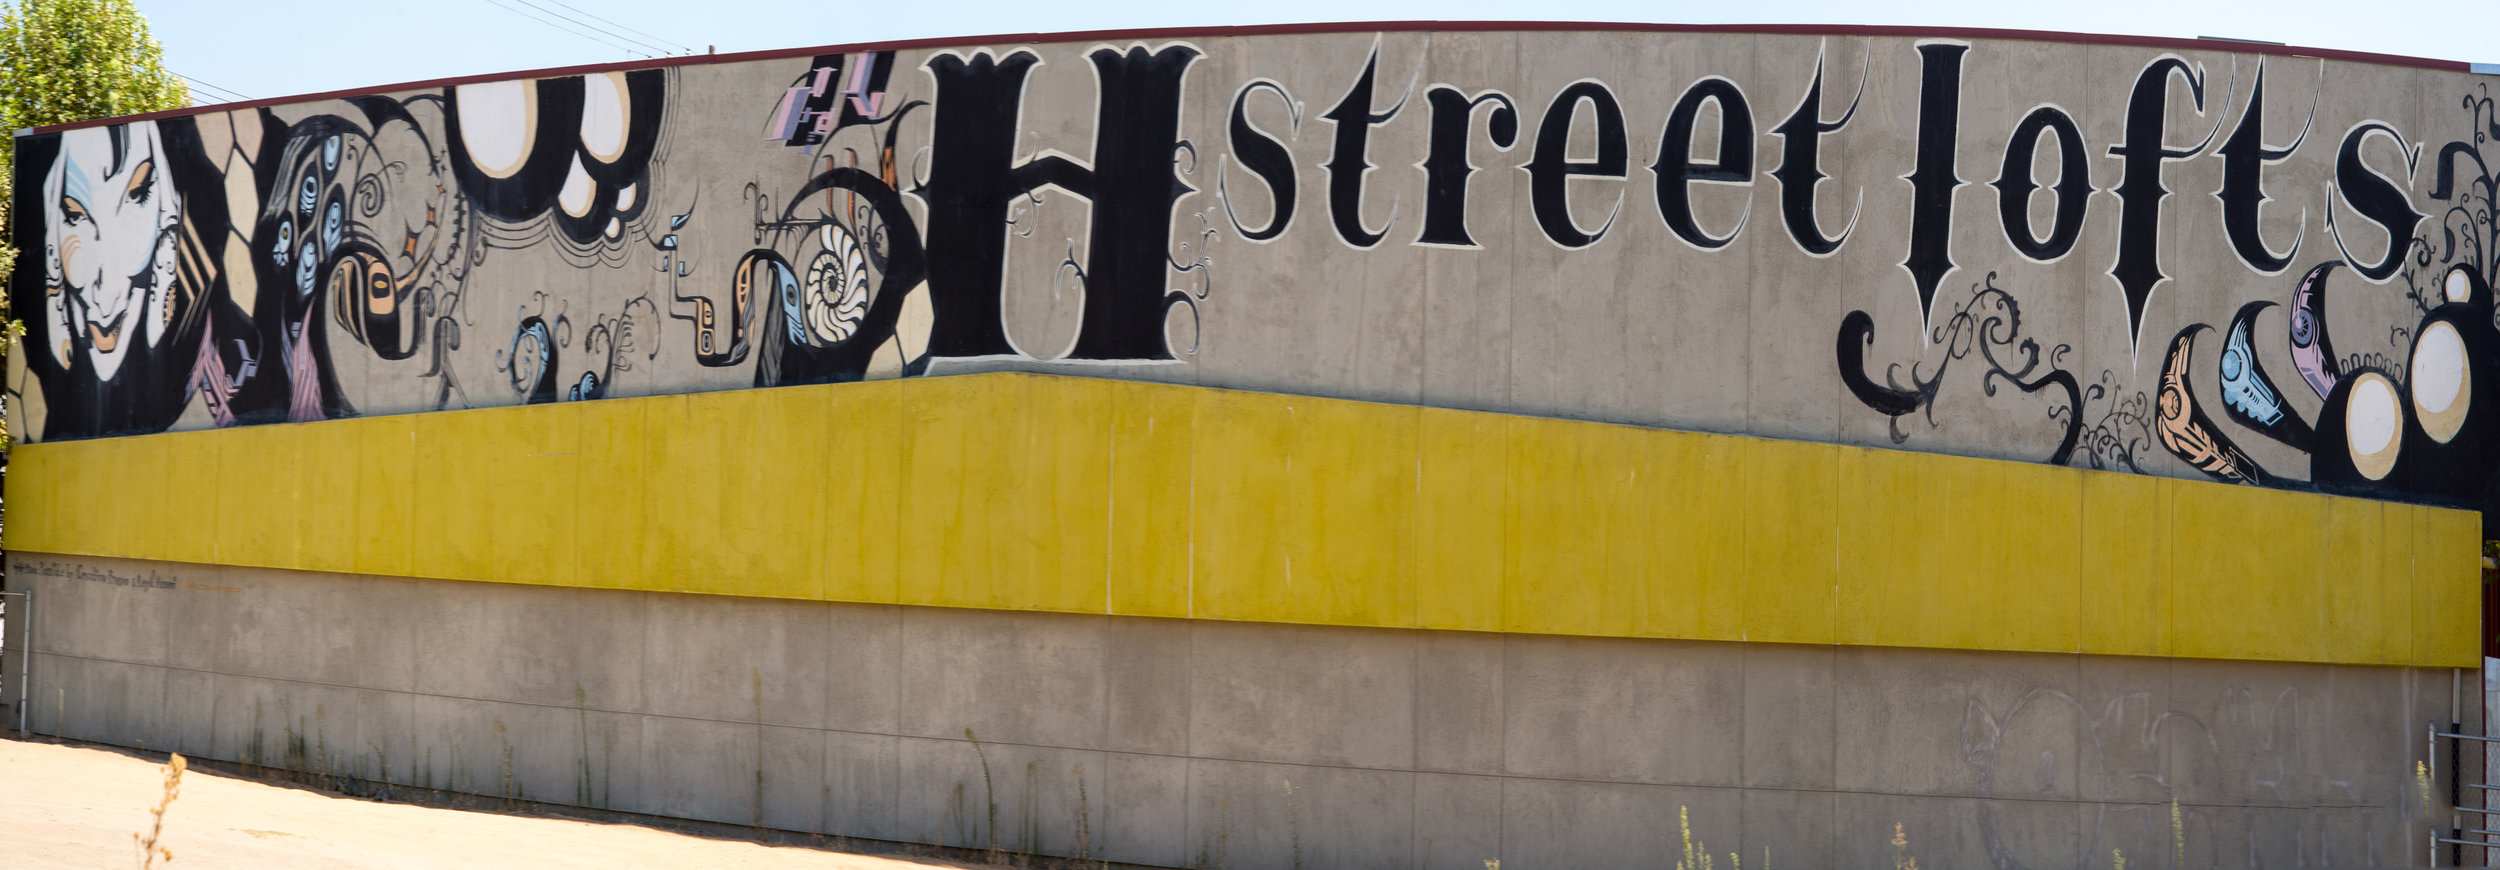 H street Lofts, 1814 H St, 93721, D.jpg